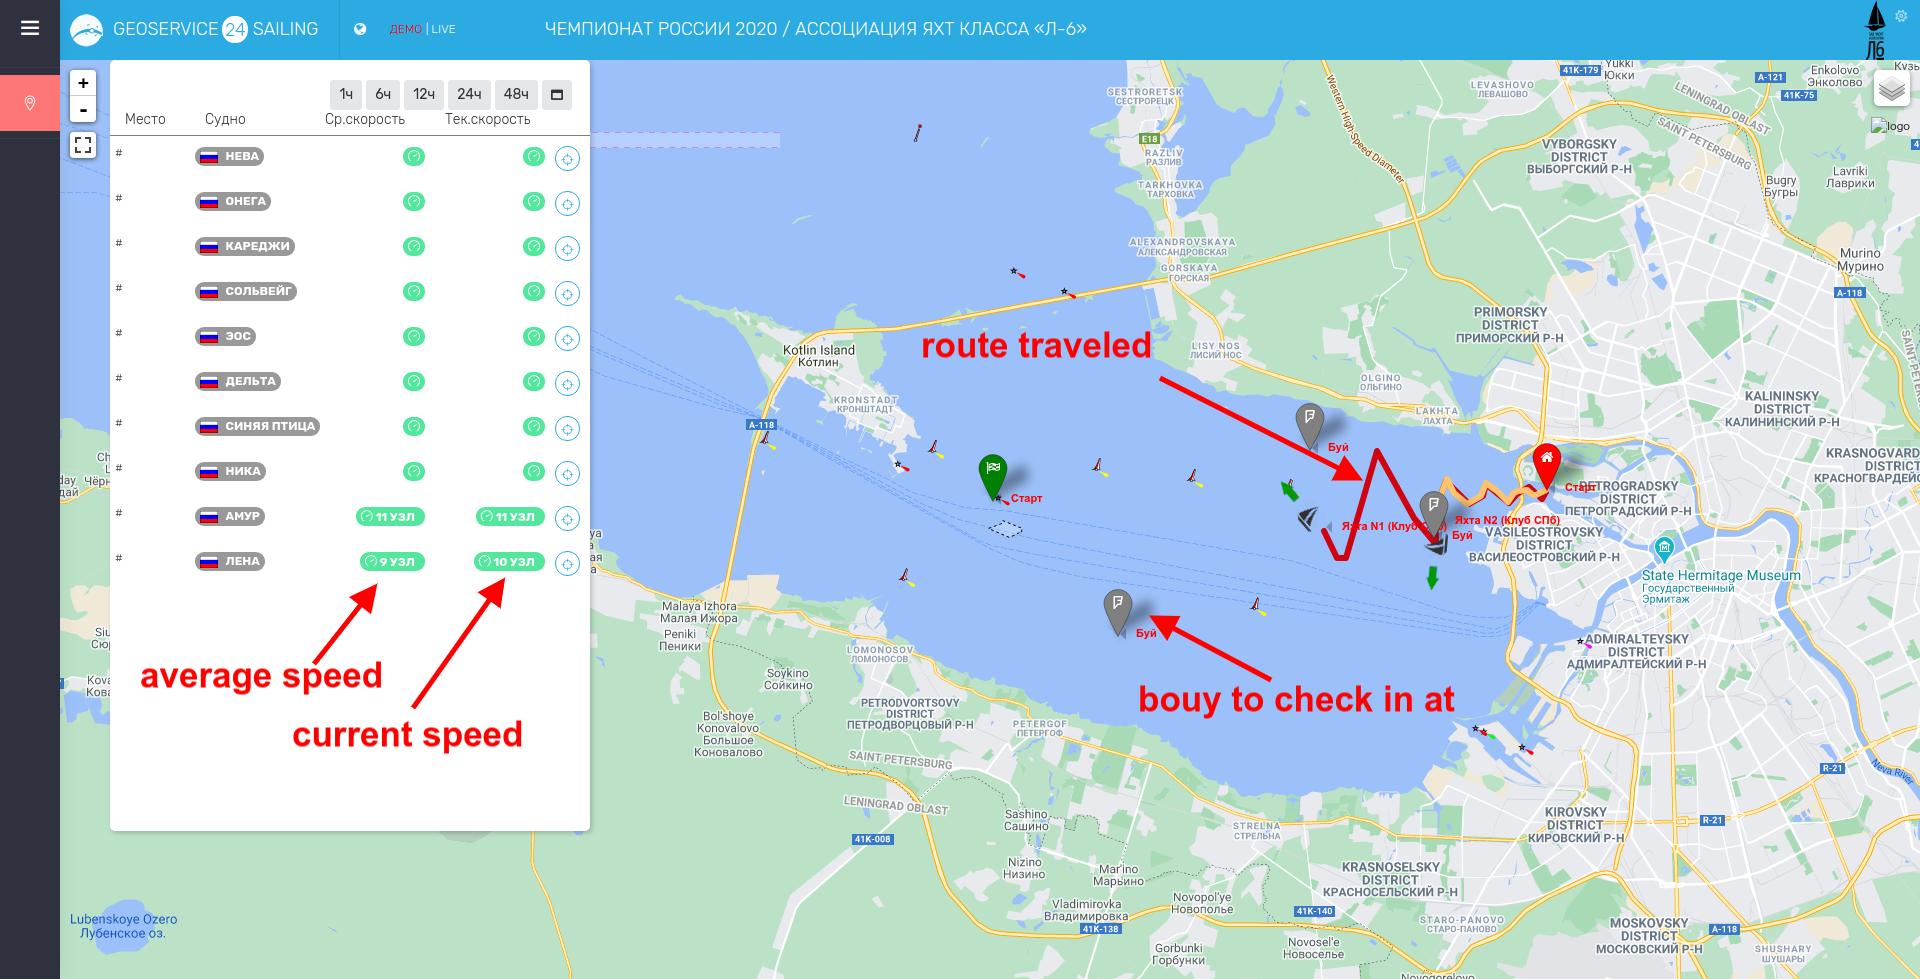 geoservice 24 sailing flespi map